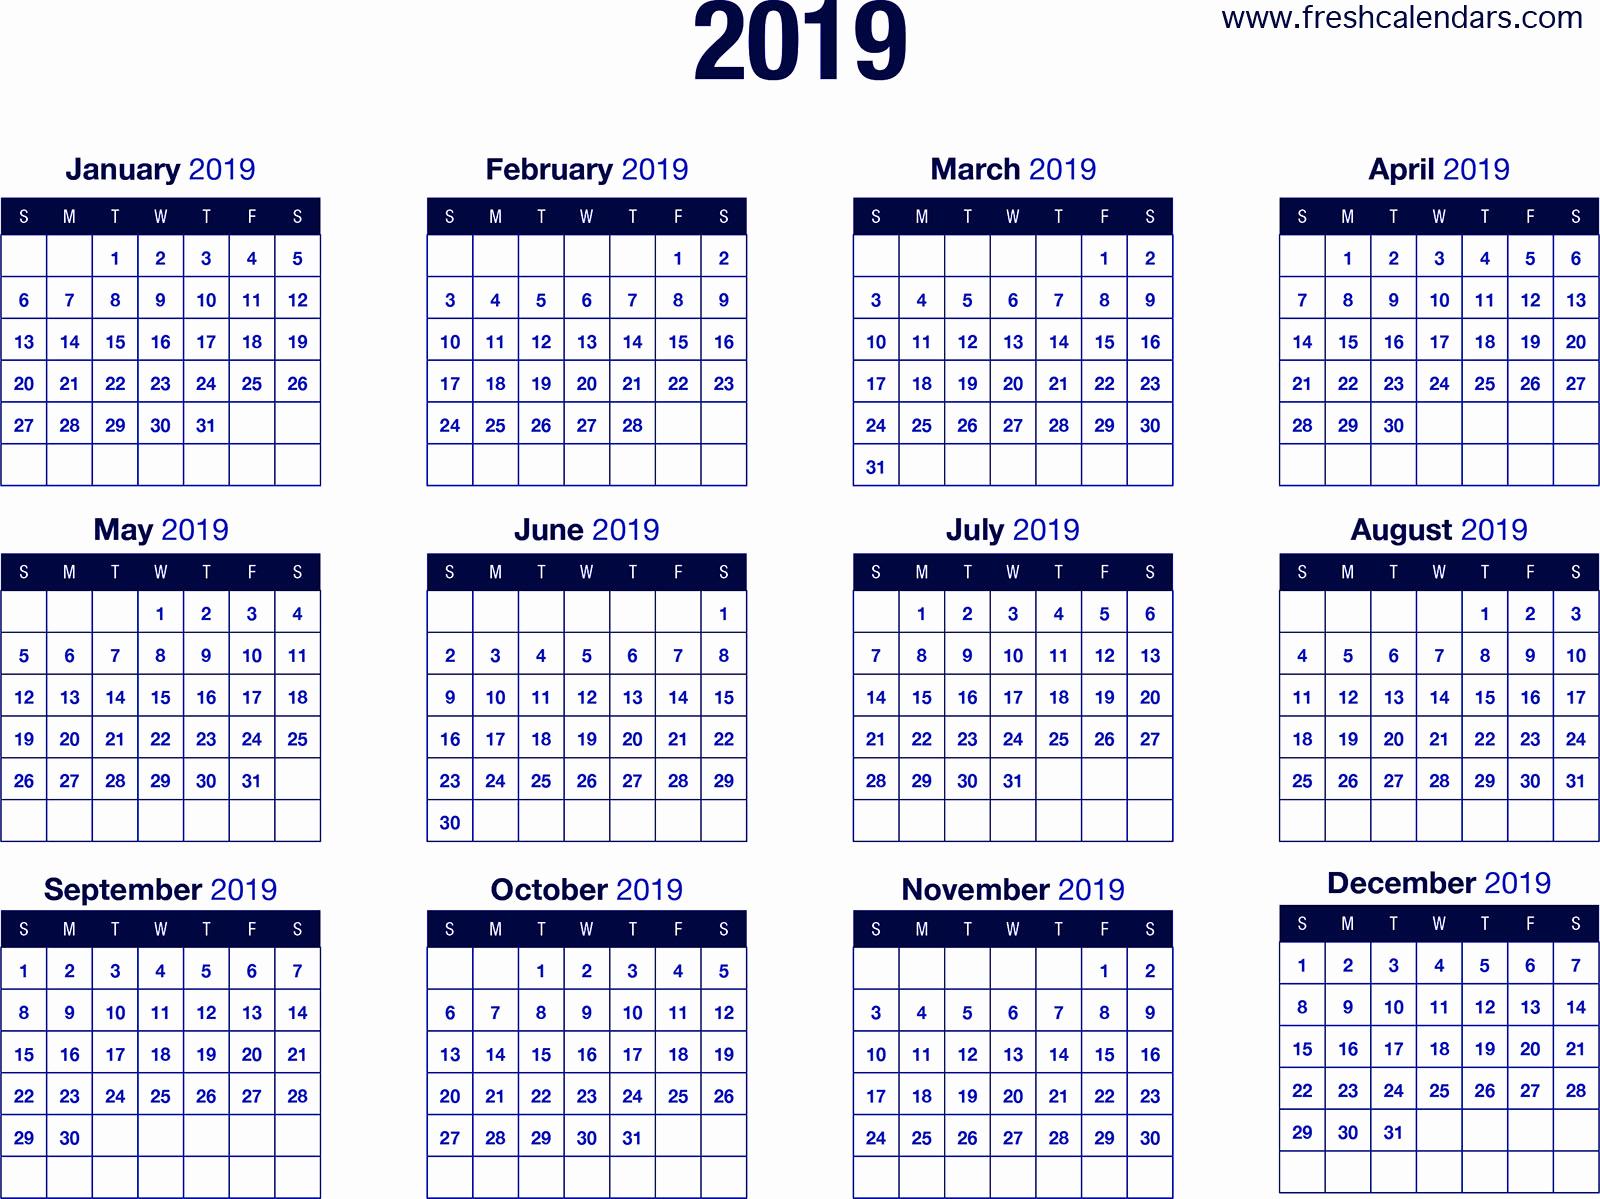 Blank Calendar Template 2019 Unique 2019 Calendar